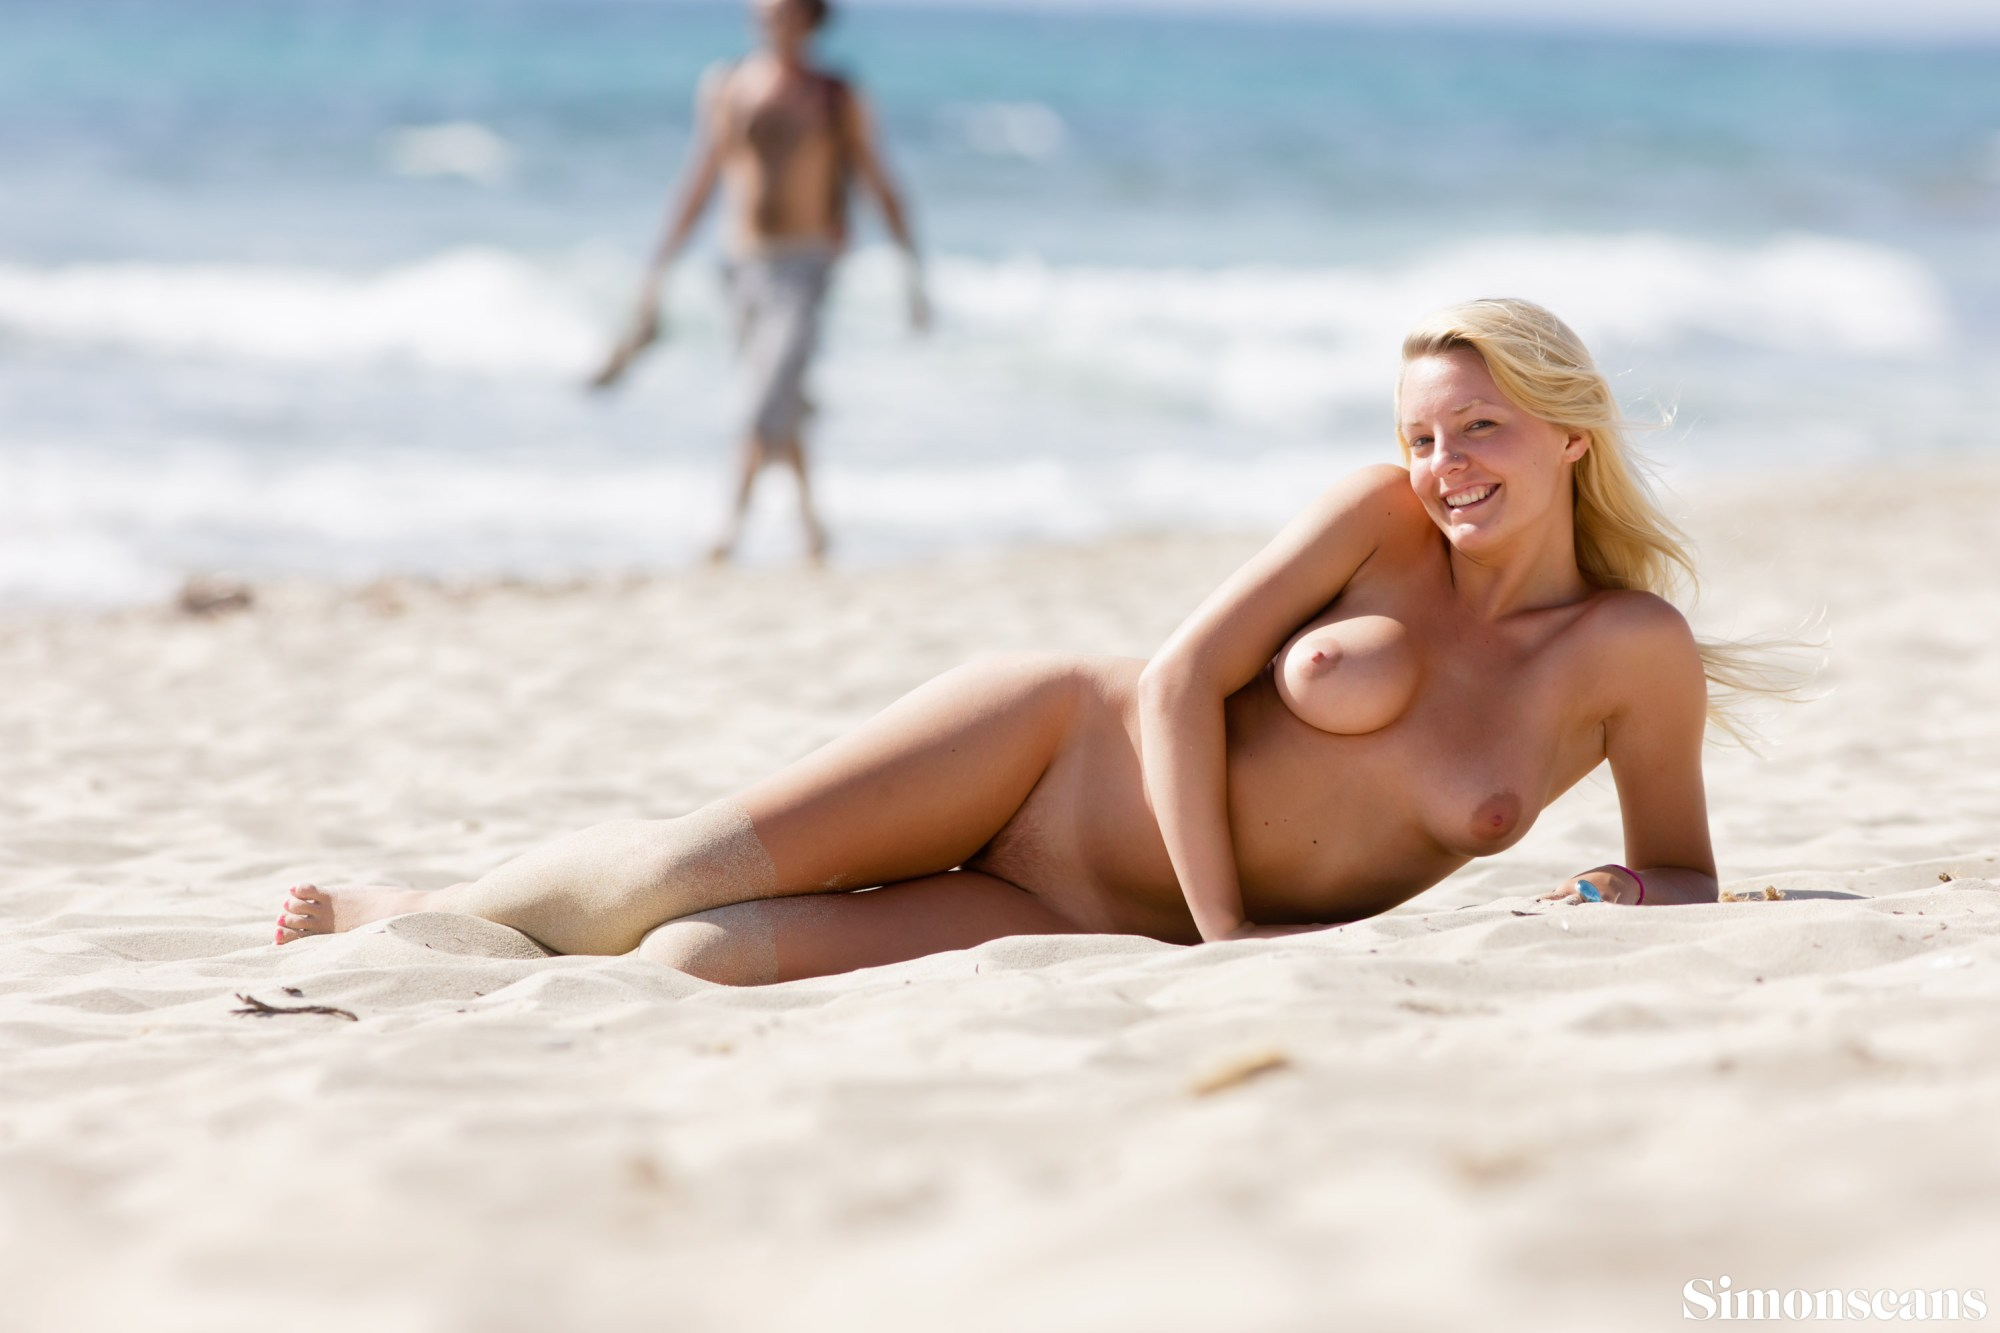 Hayden on the nudist beach